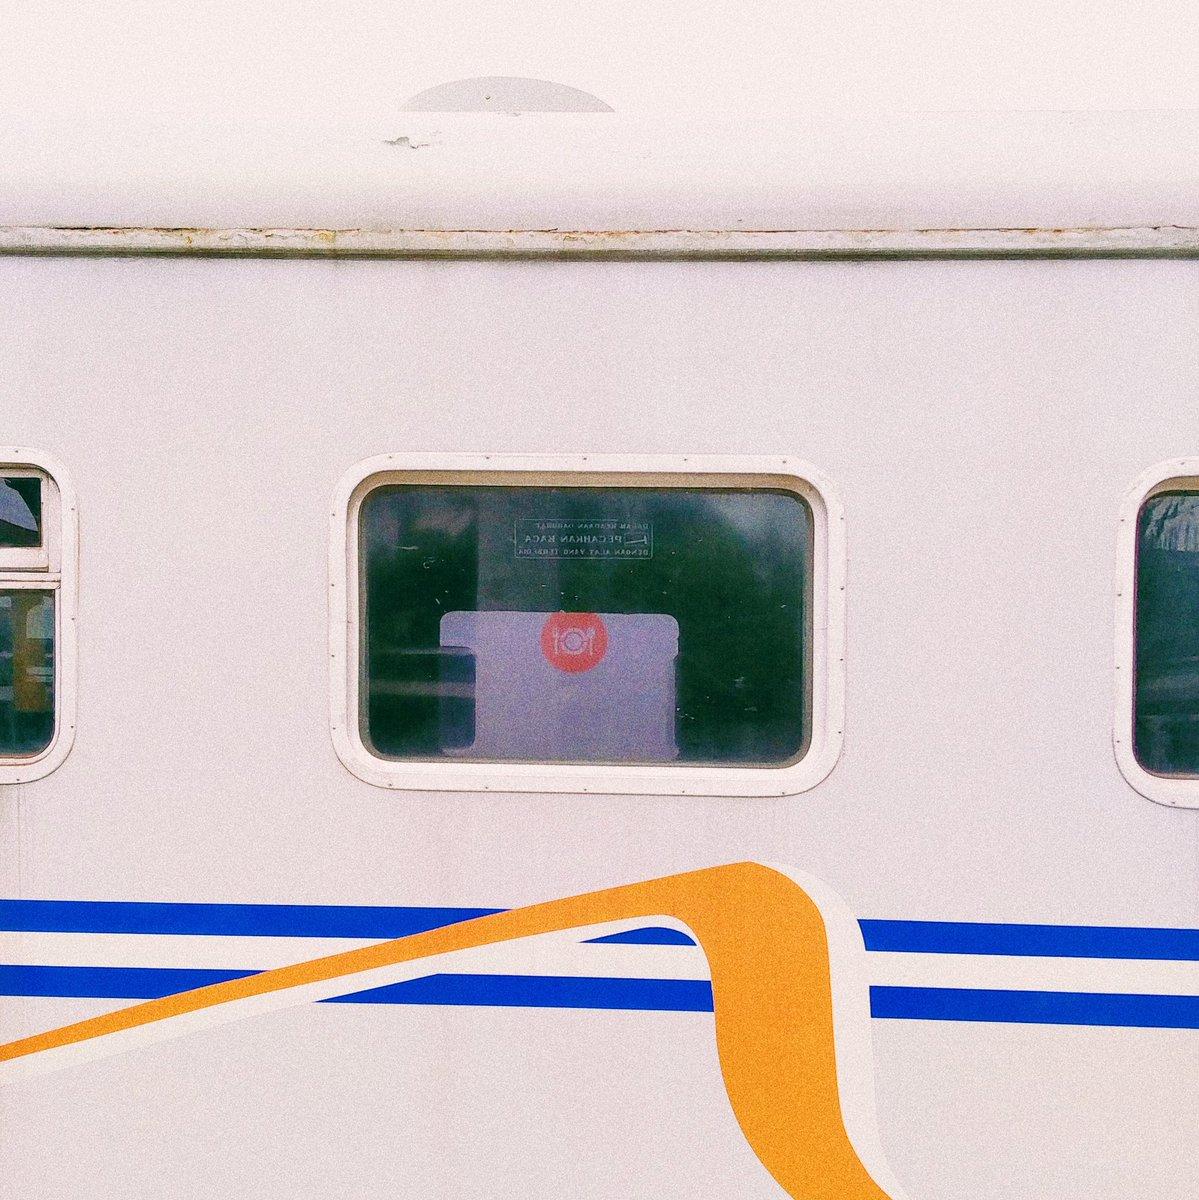 Tebak lokasi  Yak benar, di Adisucipto. #shotbyphone #ShotOnOPPO